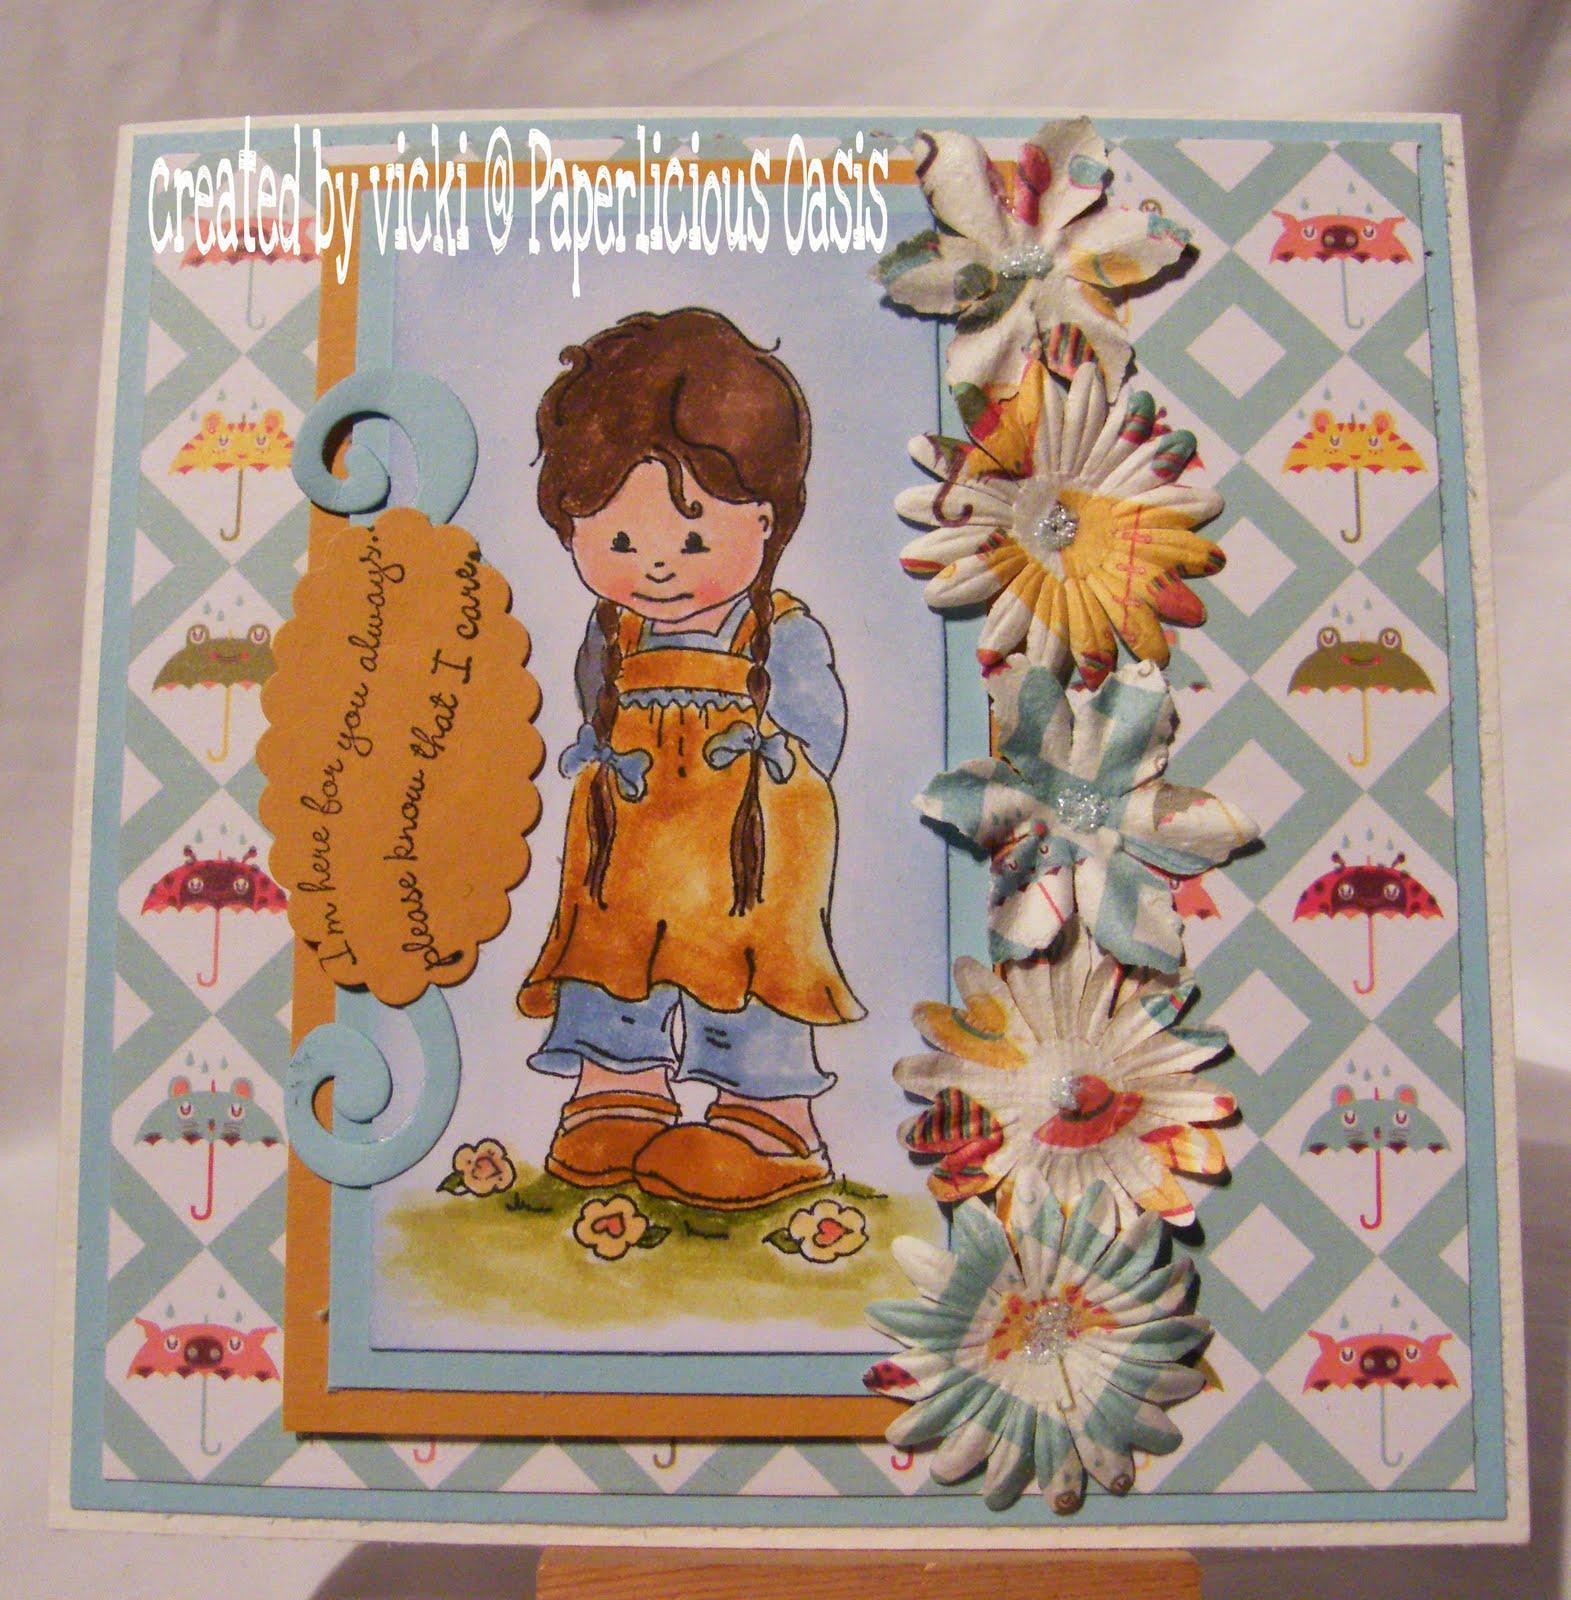 http://2.bp.blogspot.com/_xaSy1wcnLBI/TGCRtqQVjiI/AAAAAAAACfY/4JUHIdVPUwc/s1600/mimosa+sorry.jpg